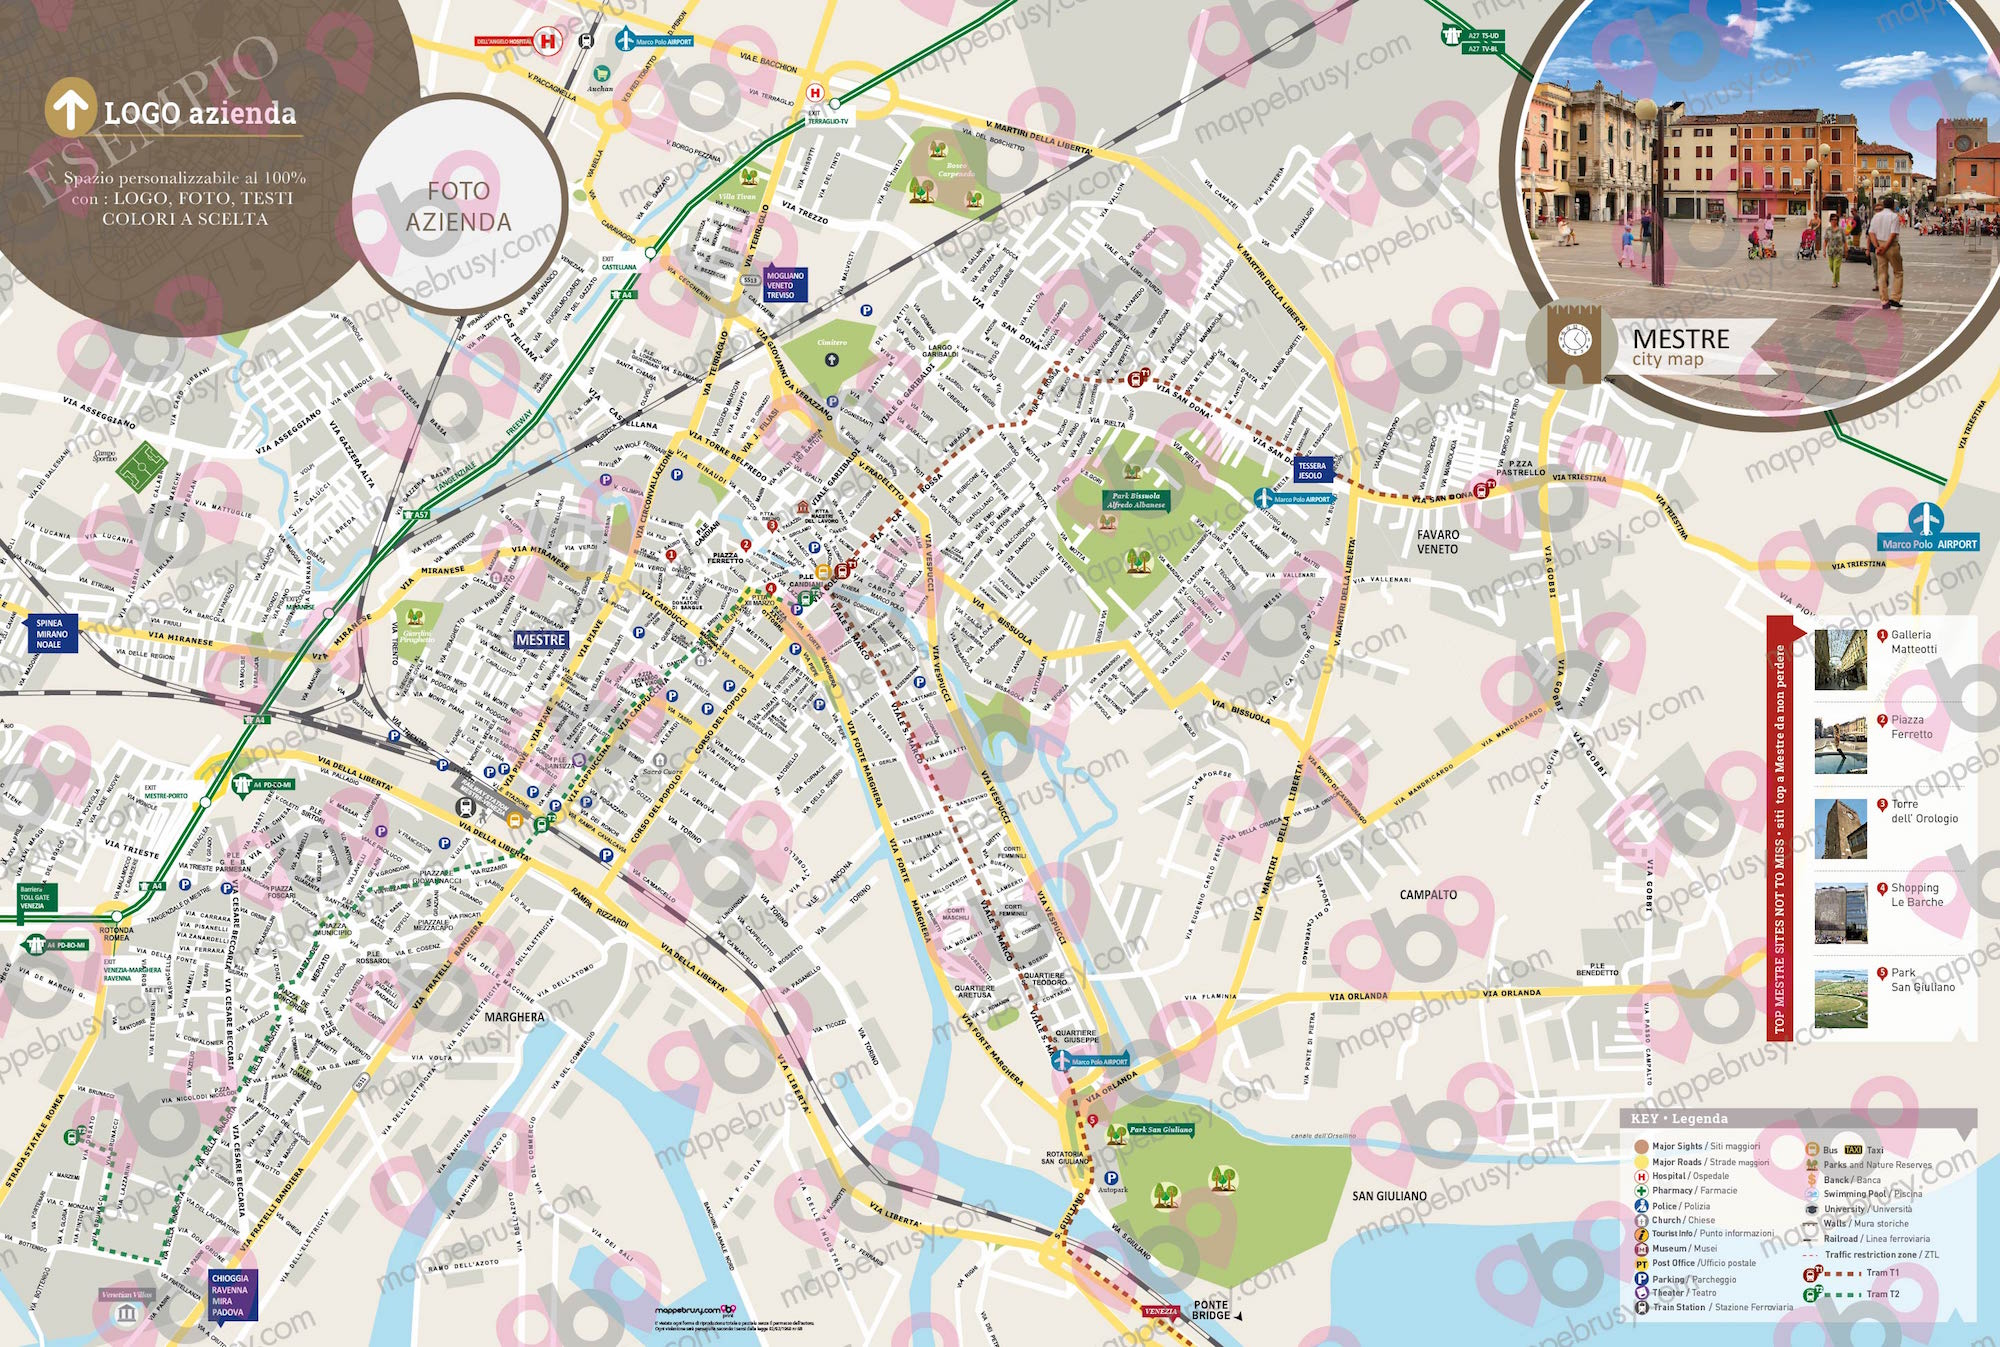 Cartina Venezia Mestre.Mestre Venezia Mappe Brusy